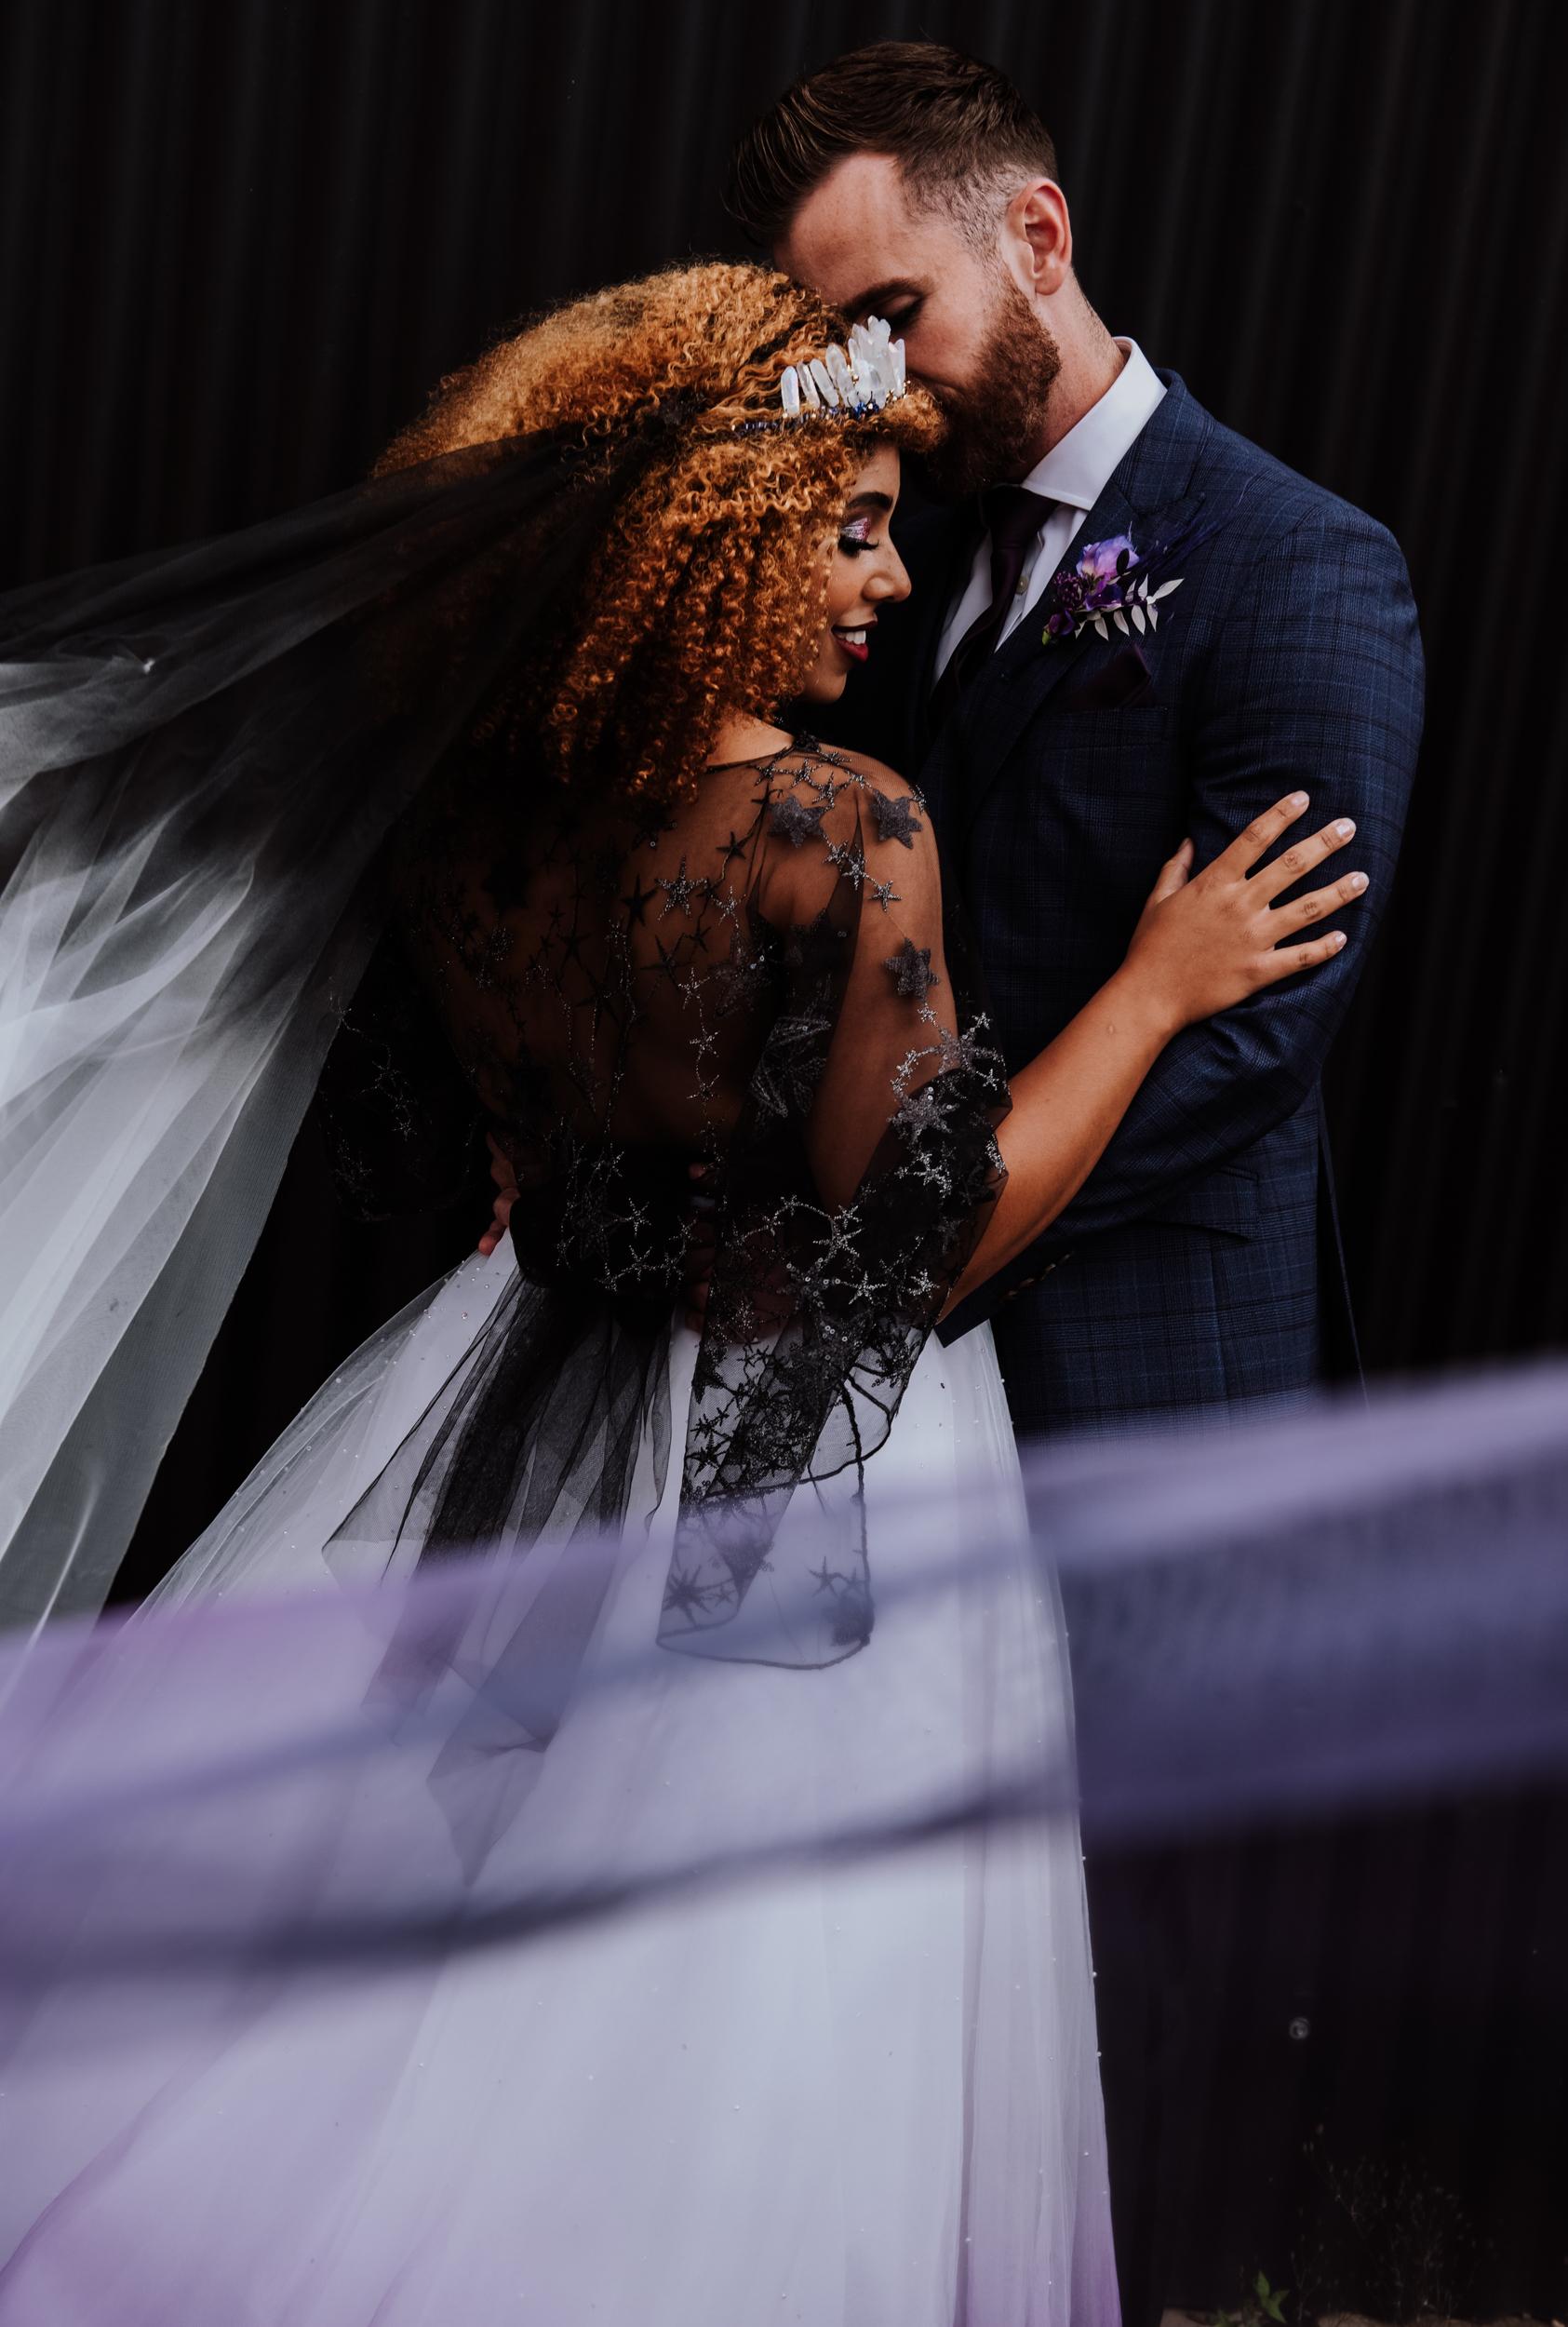 dip dye wedding dress - ombre wedding dress - galaxy wedding dress - celestial wedding dress - ombre wedding veil - alternative bridal wear - alternative wedding dress